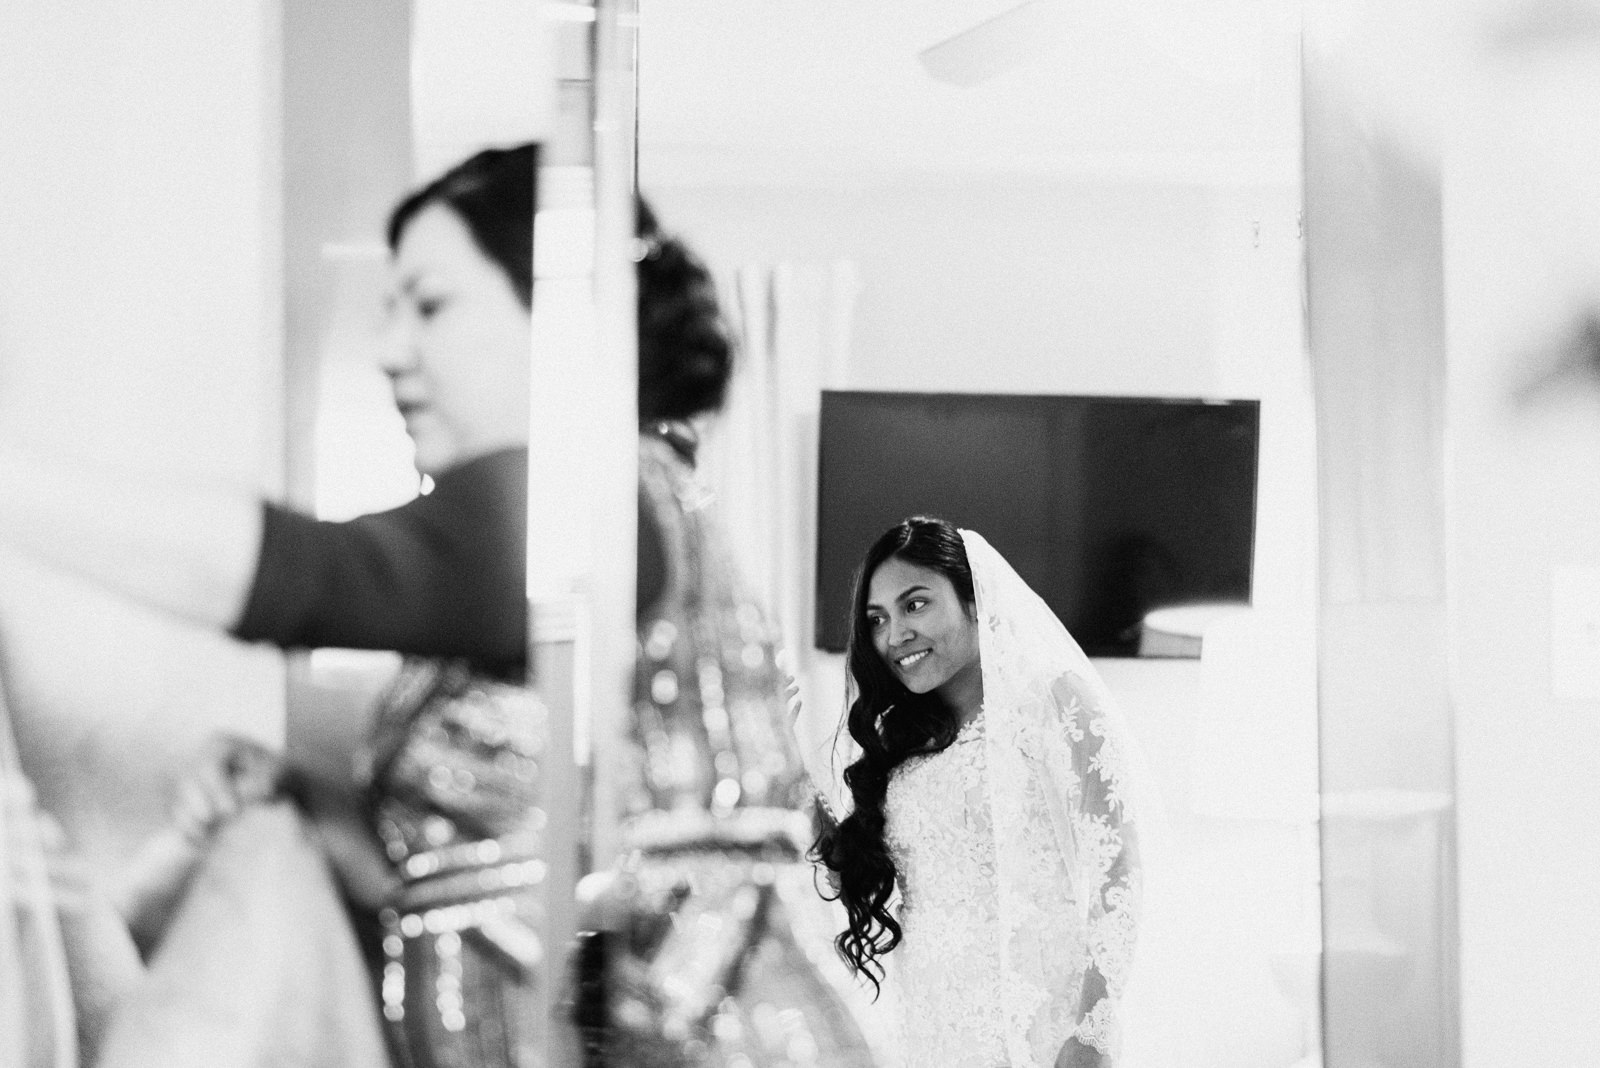 bride gets ready before wedding